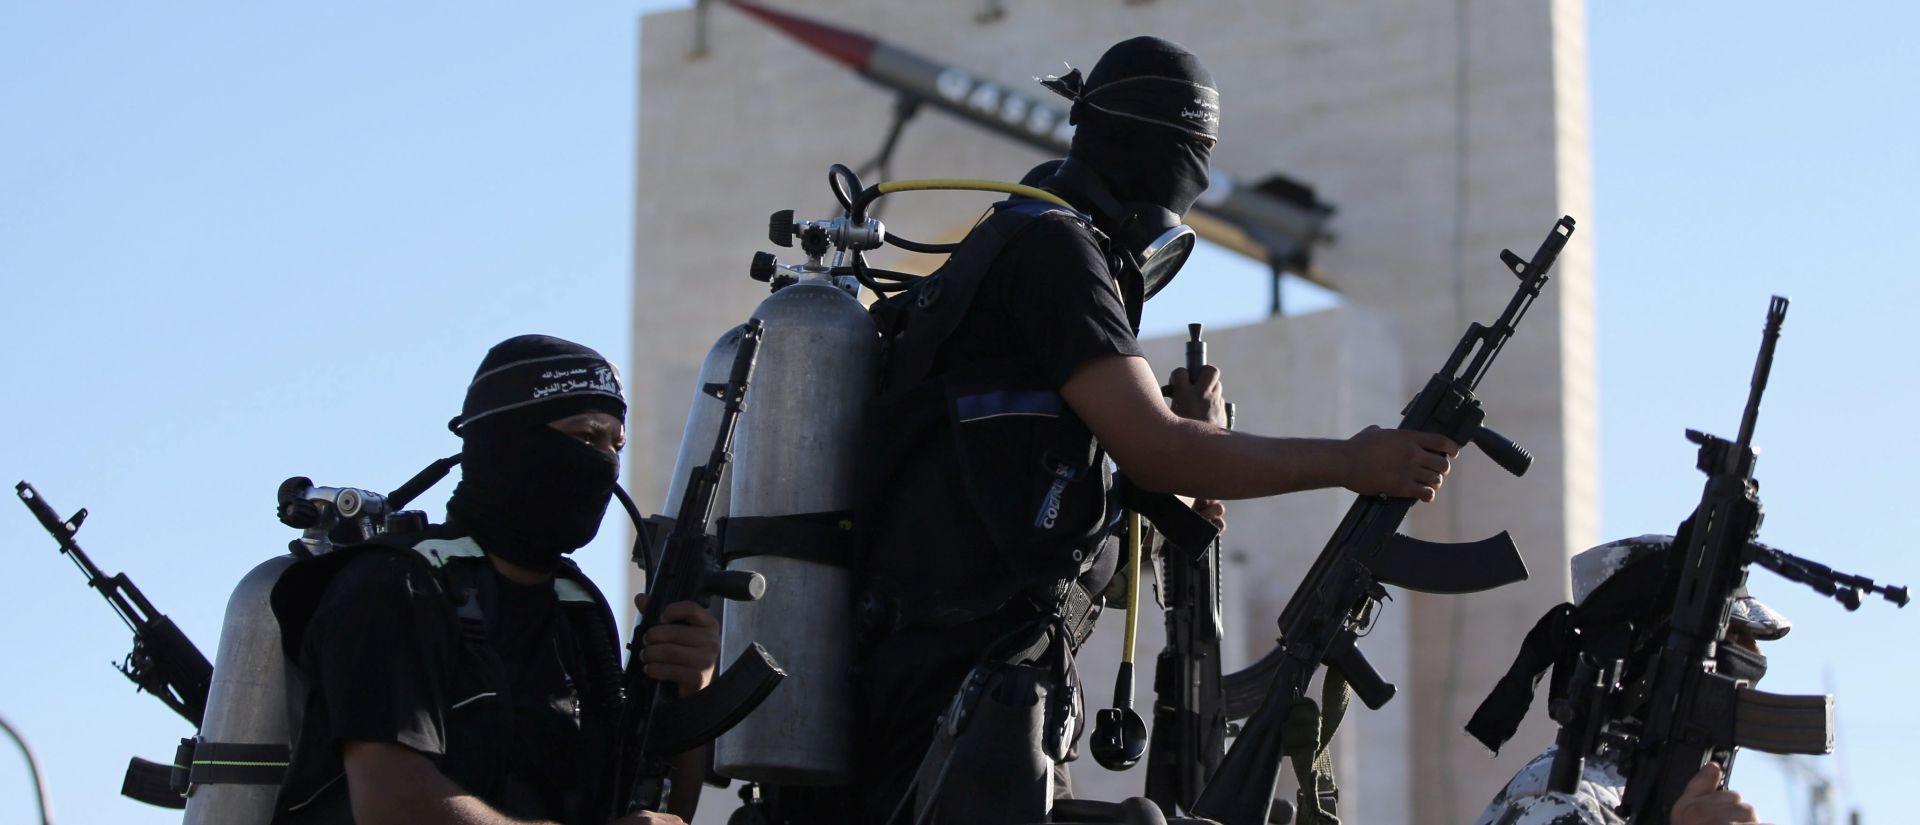 SUPARNIČKE PALESTINSKE SKUPINE Hamas i Fatah potpisali sporazum o pomirbi